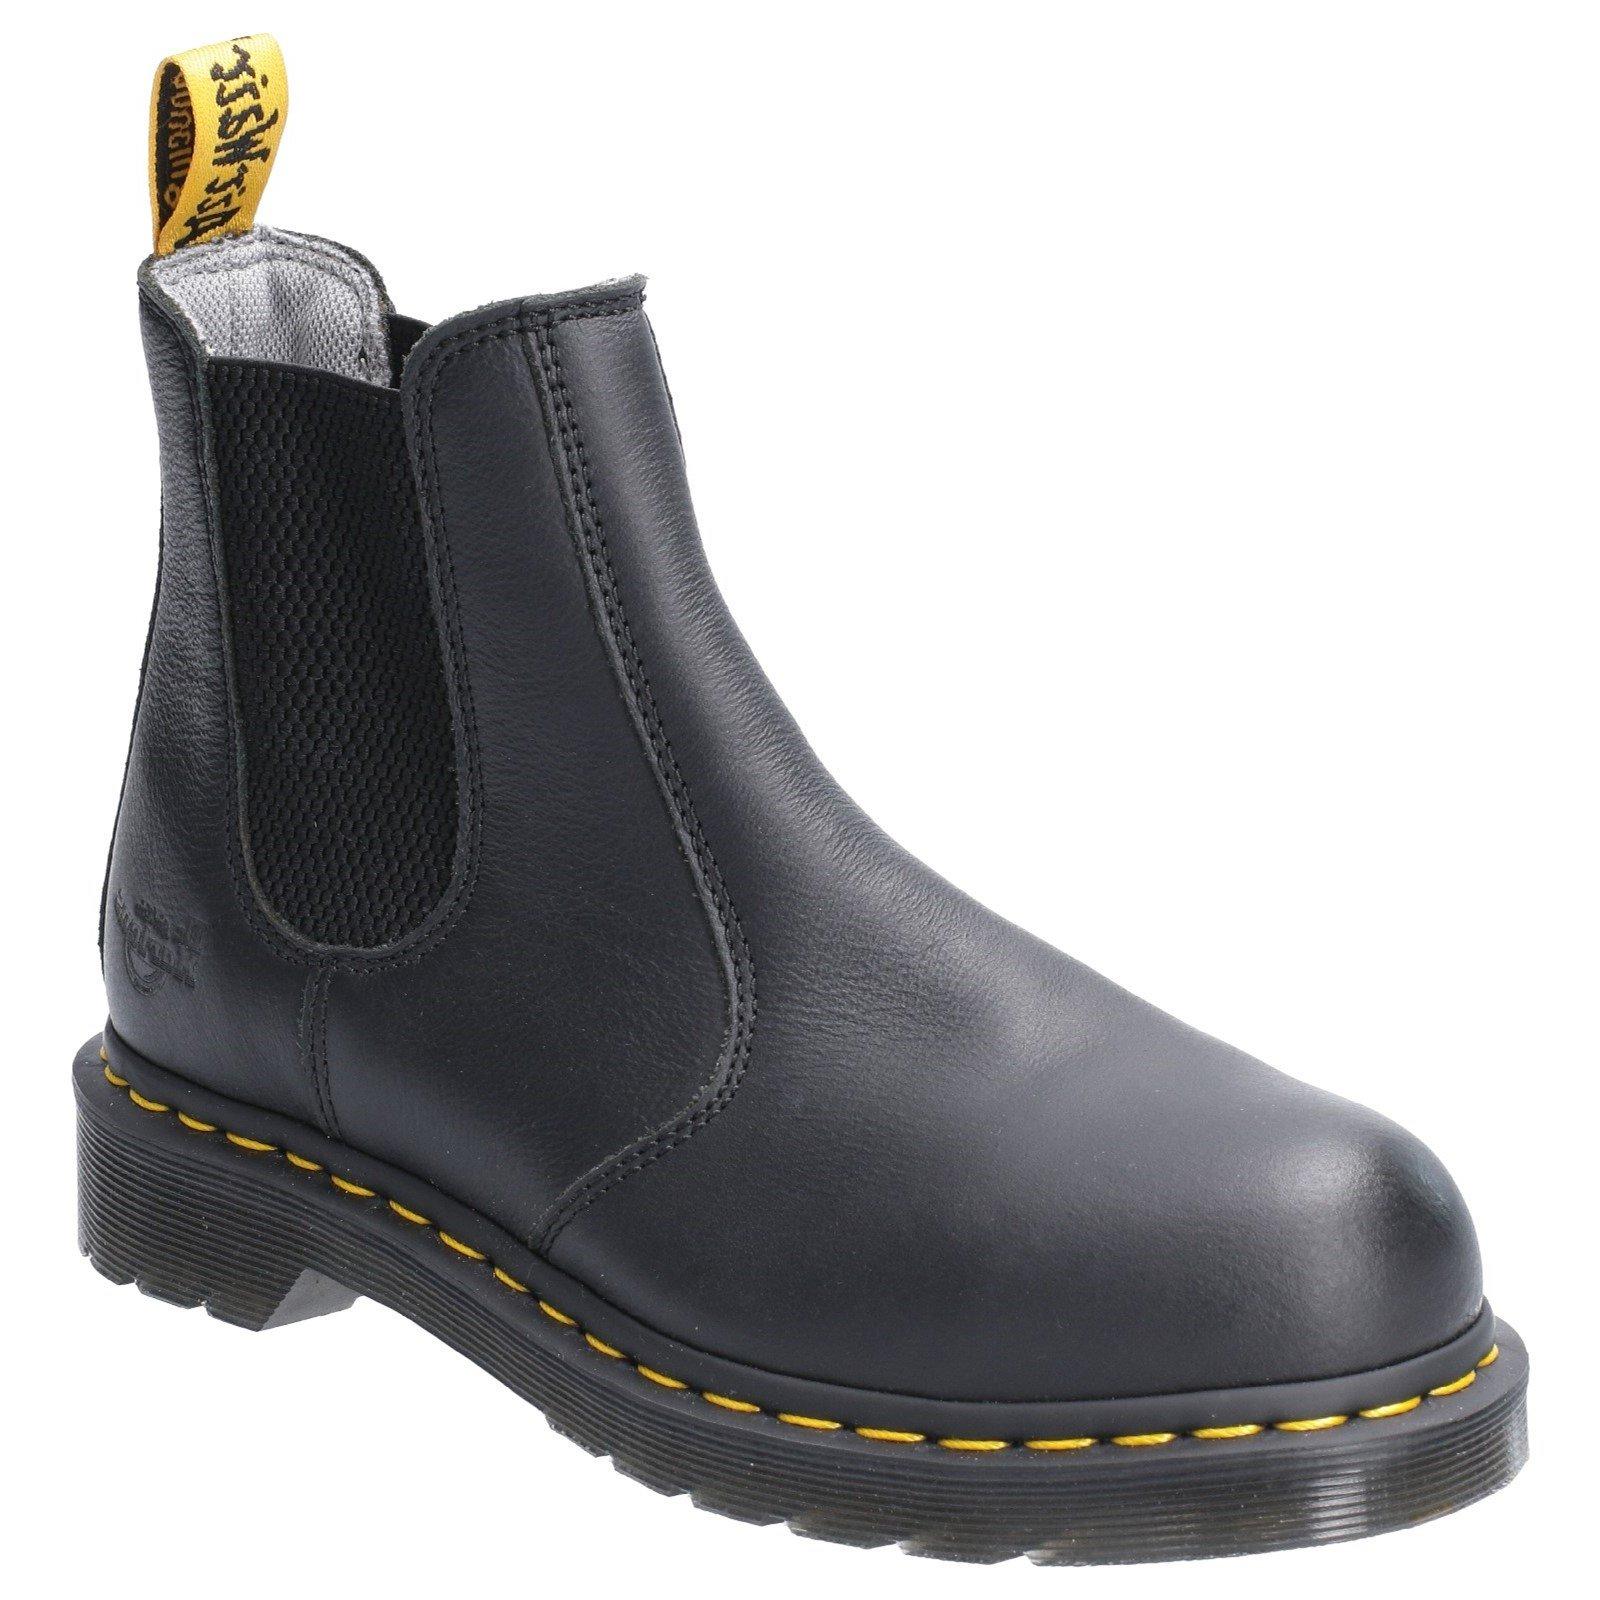 Dr Martens Women's Arbor Elastic Safety Boot Various Colours 29517 - Black 5